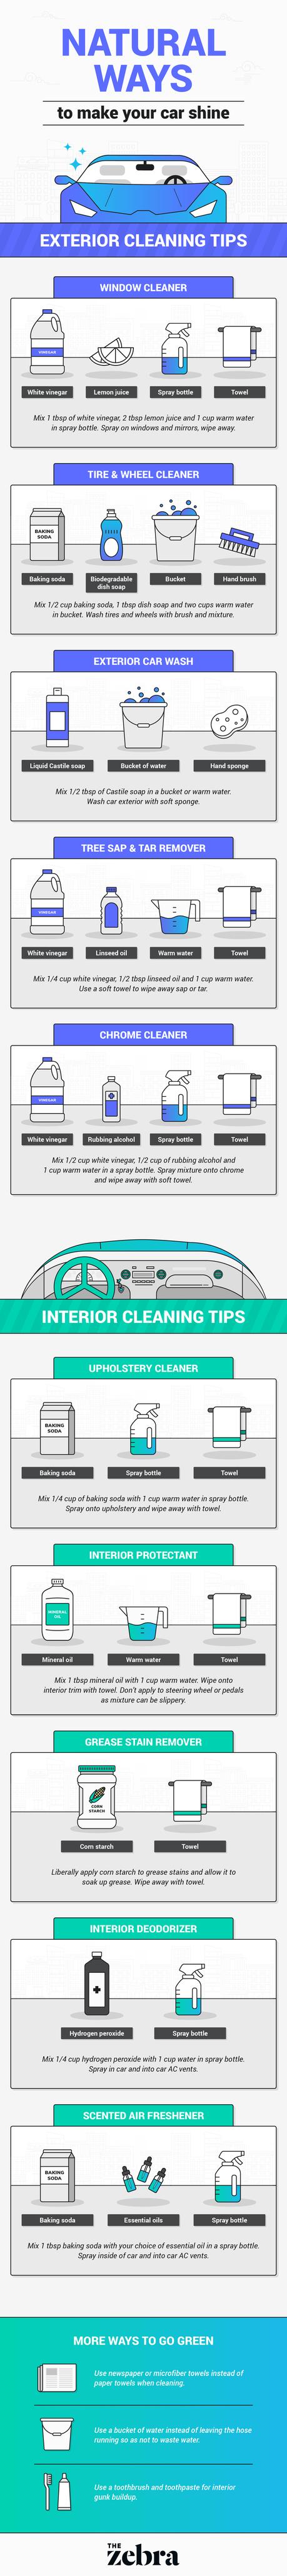 Image: Natural Ways to Make Your Car Shine